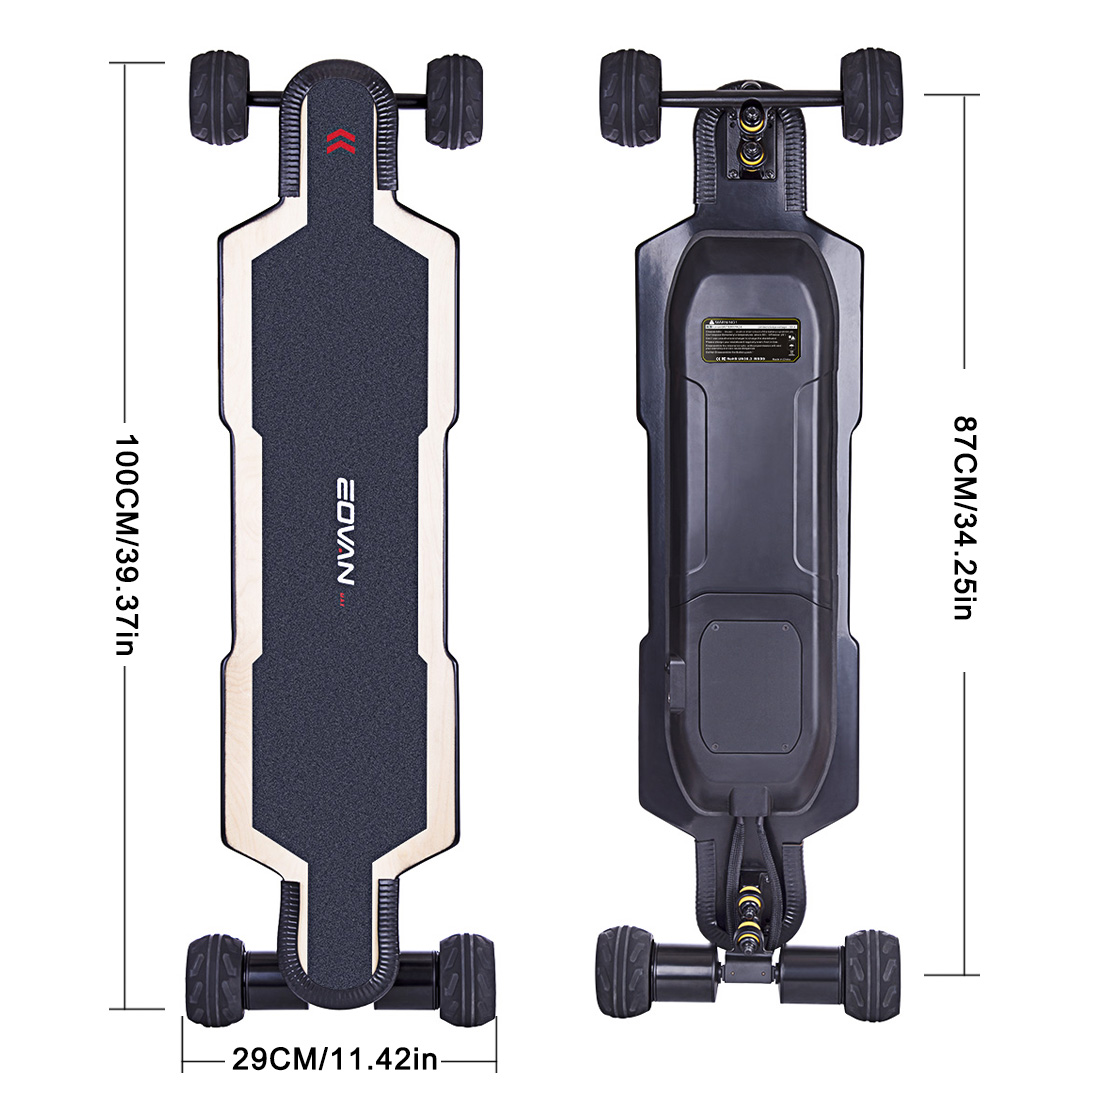 BRT-02 4-Wheel Electric Skateboard - AU/UK/EU/US Plug